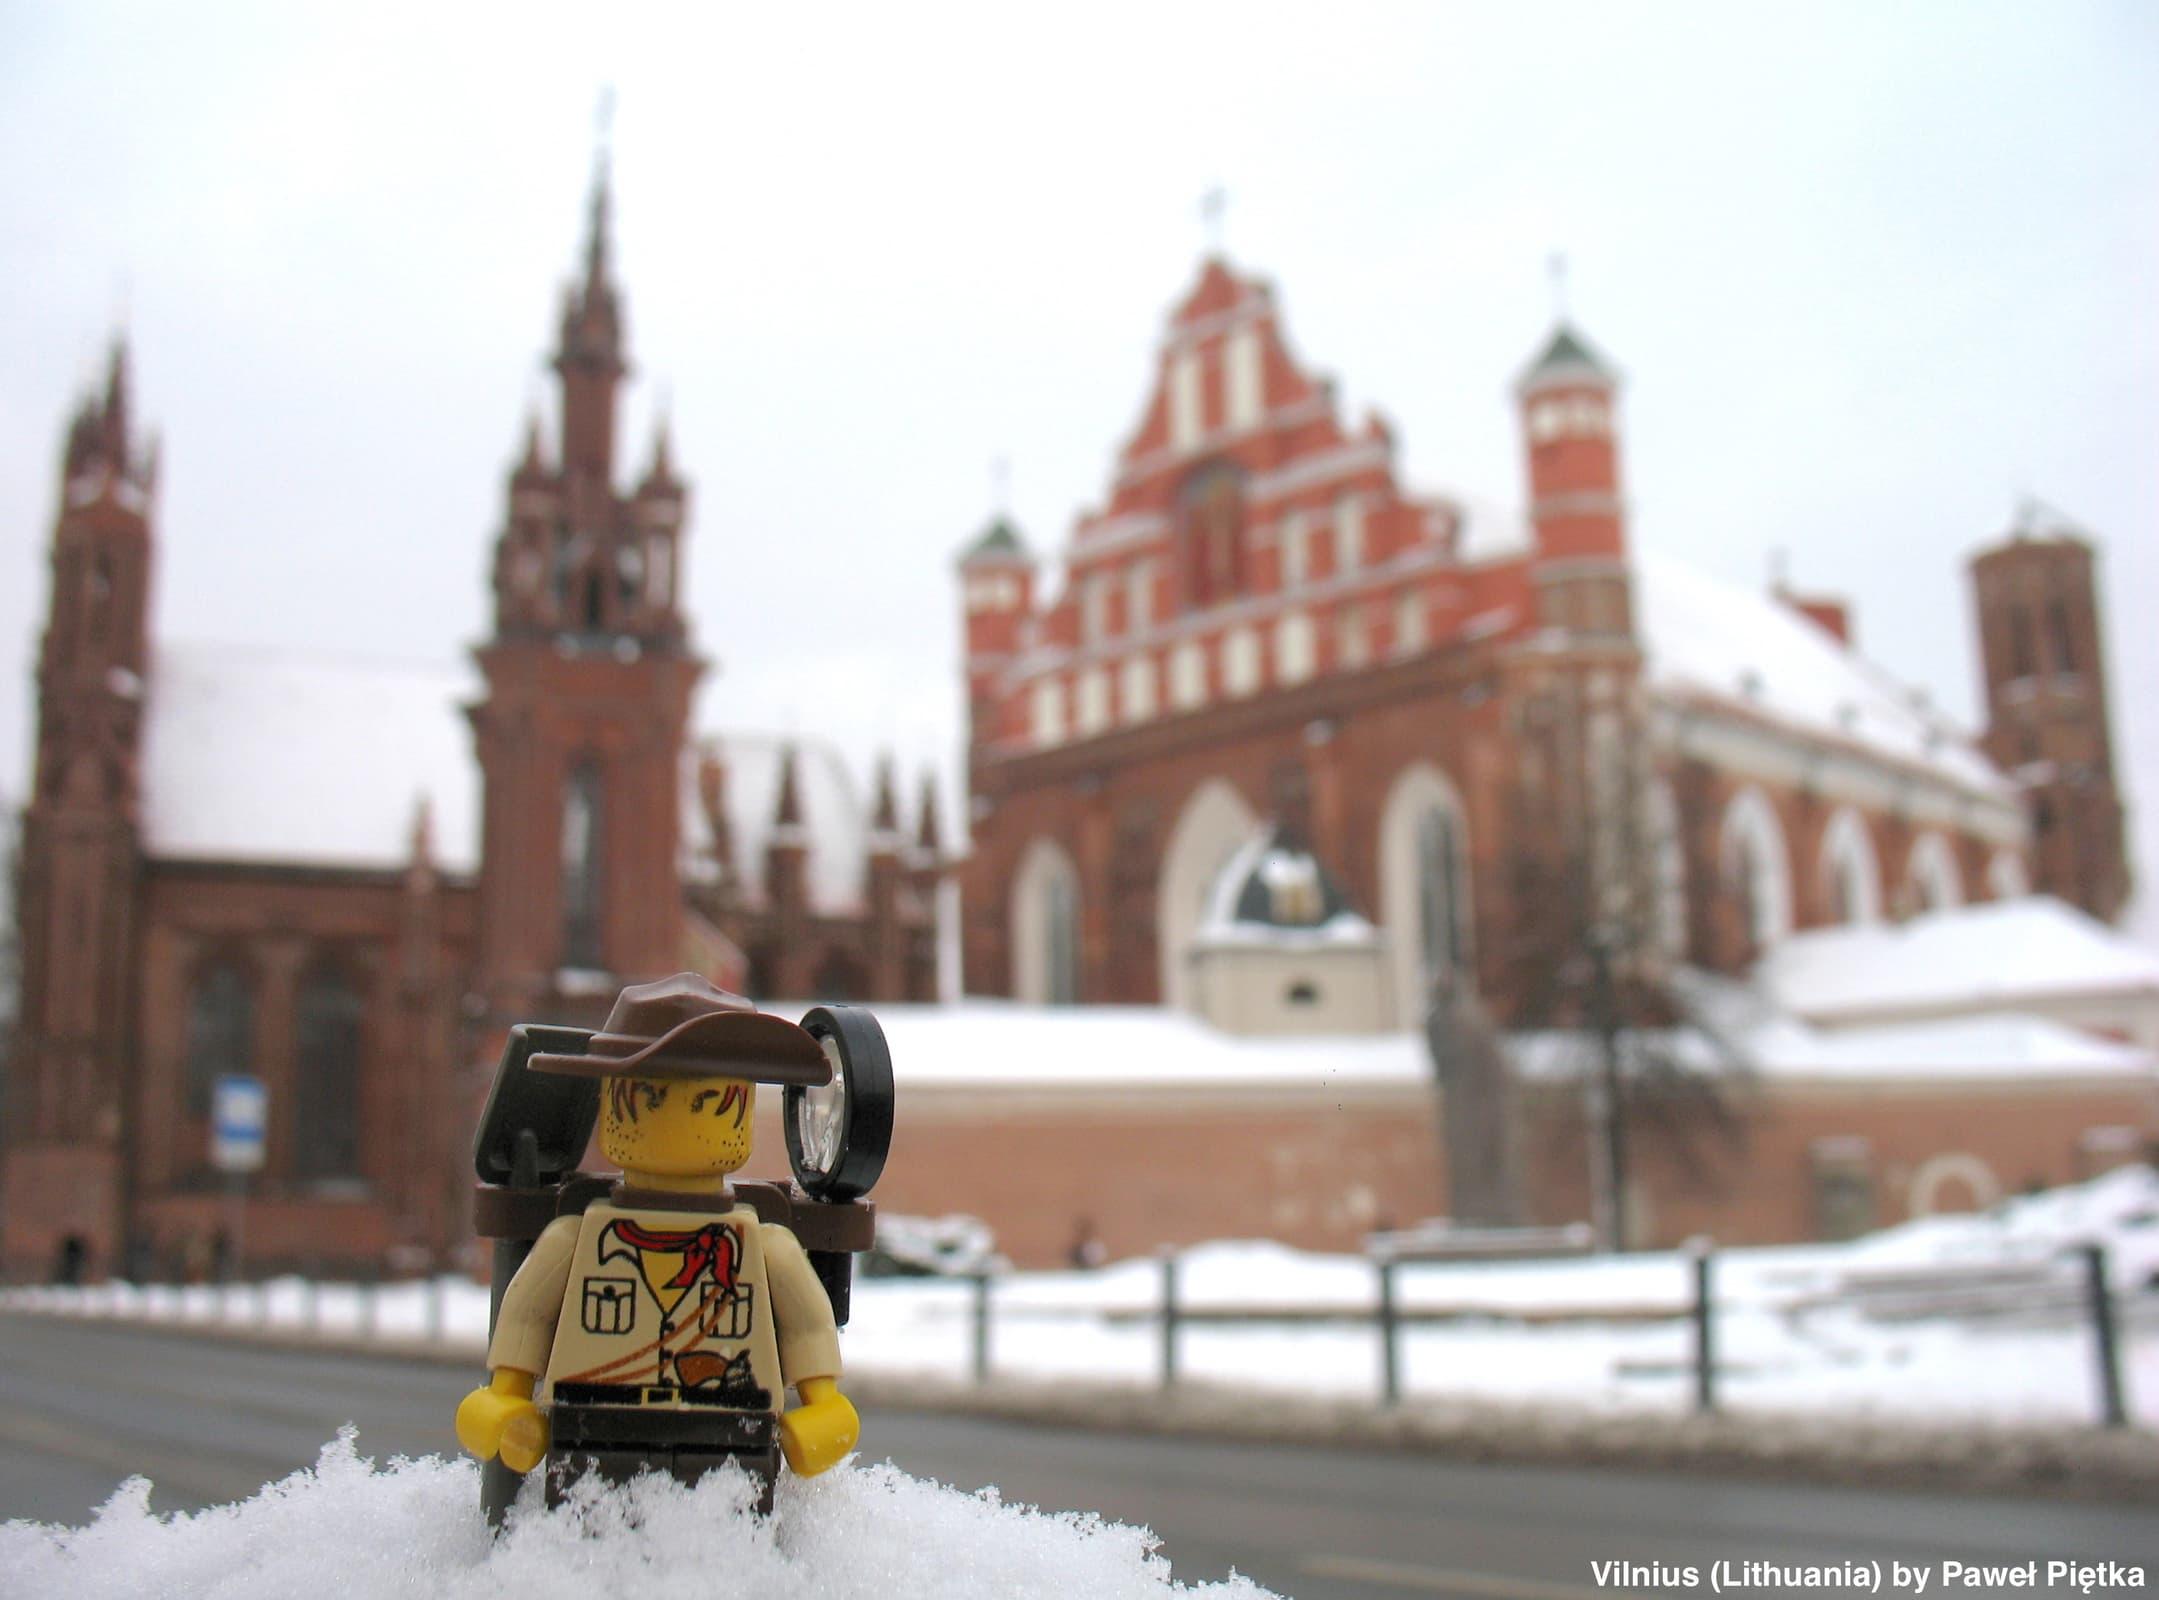 Vilnius (Lithuania) - St Anne's Church